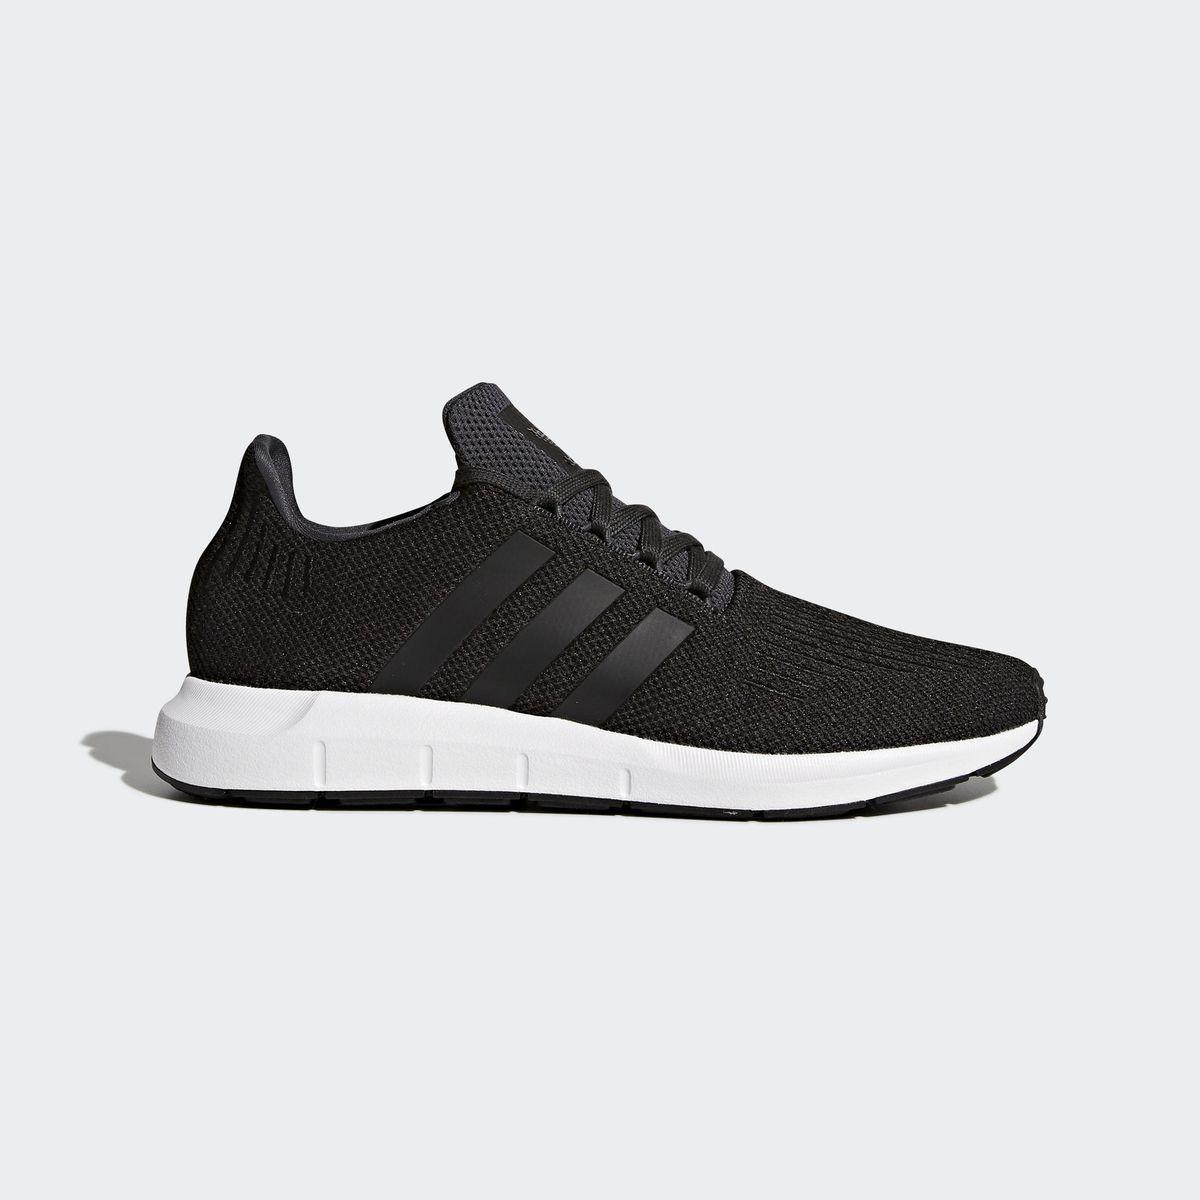 Baskets Swift Run   Chaussures noires, Chaussure basket et